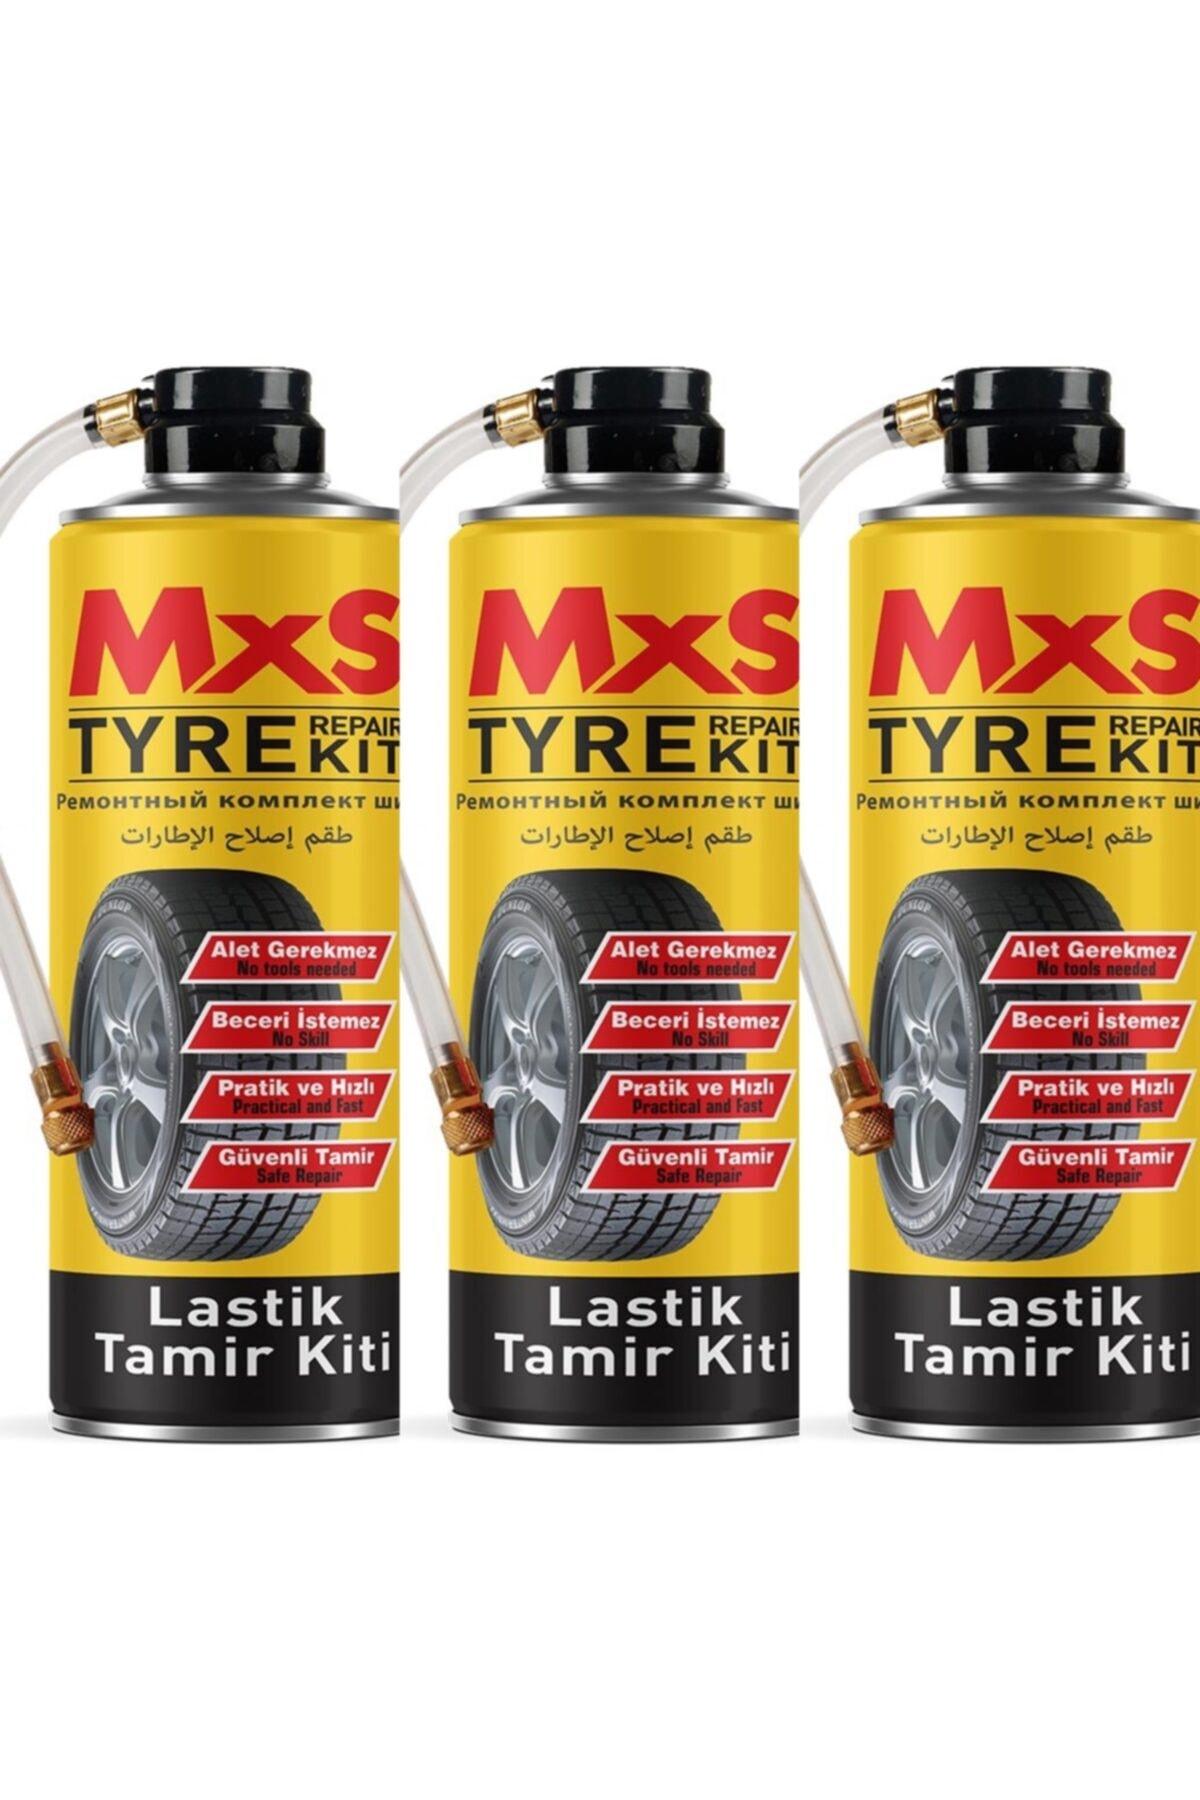 MxS Lastik Tamir Kiti 400 Ml (jel) - 3 Adet 1